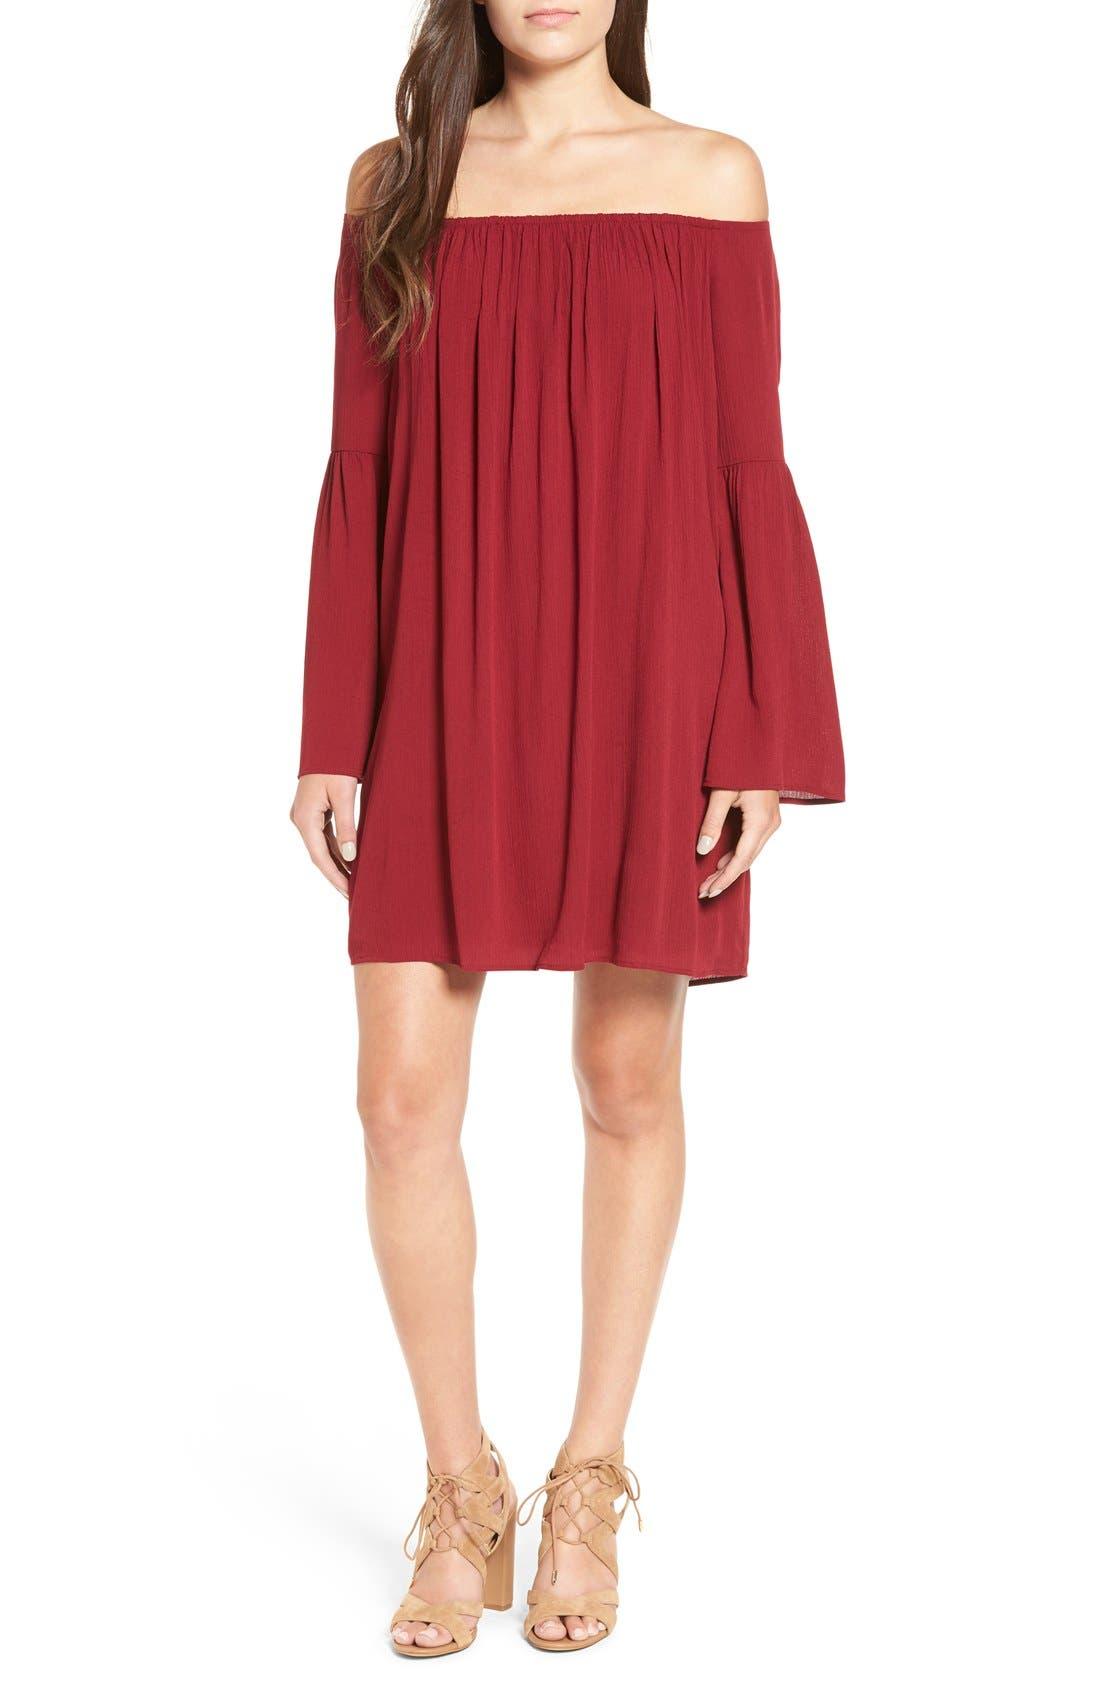 Alternate Image 1 Selected - One Clothing Off the Shoulder Shift Dress